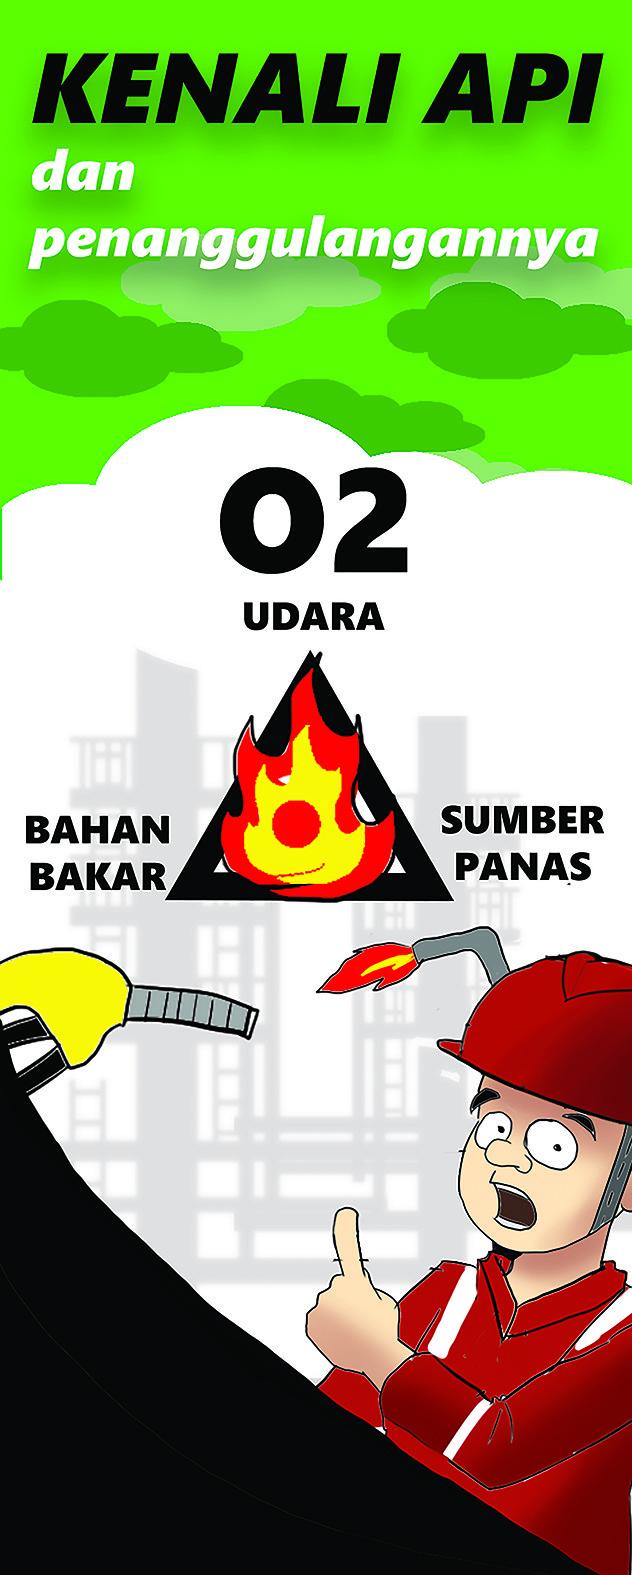 Putra wira adhiprajna pertamina api